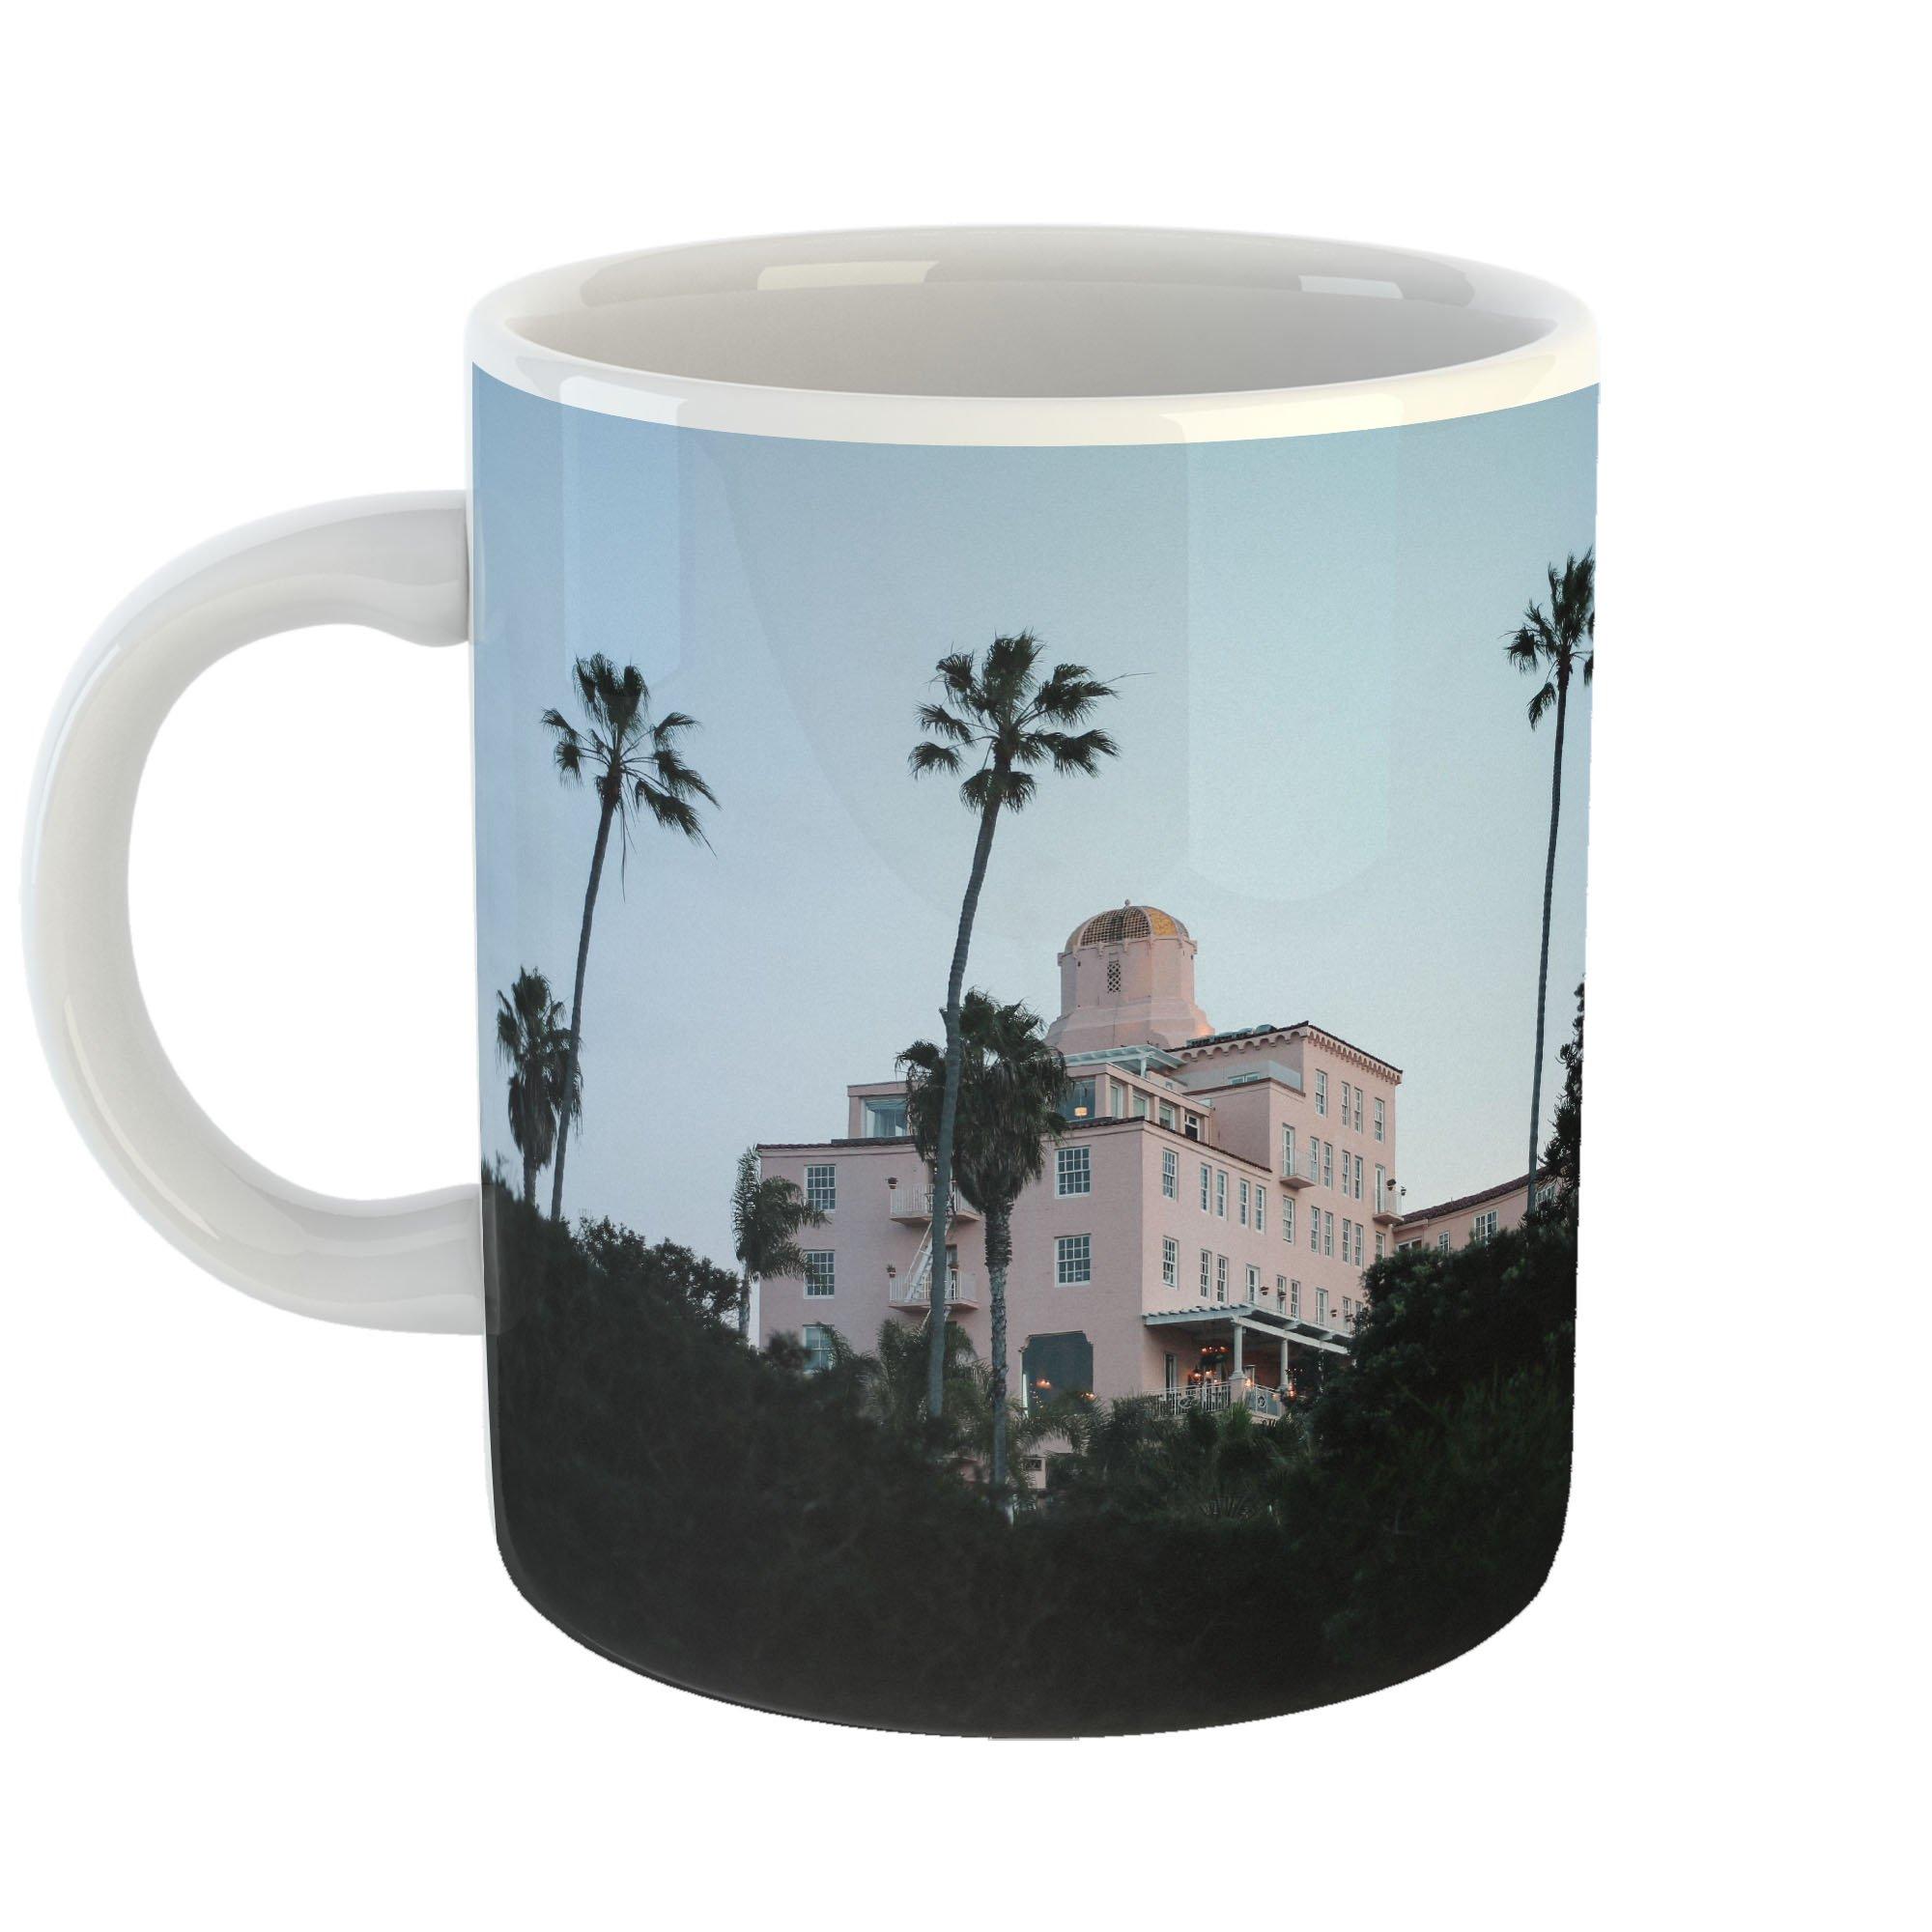 Westlake Art - Tree Hotel - 11oz Coffee Cup Mug - Modern Picture Photography Artwork Home Office Birthday Gift - 11 Ounce (EF59-9B2F4)